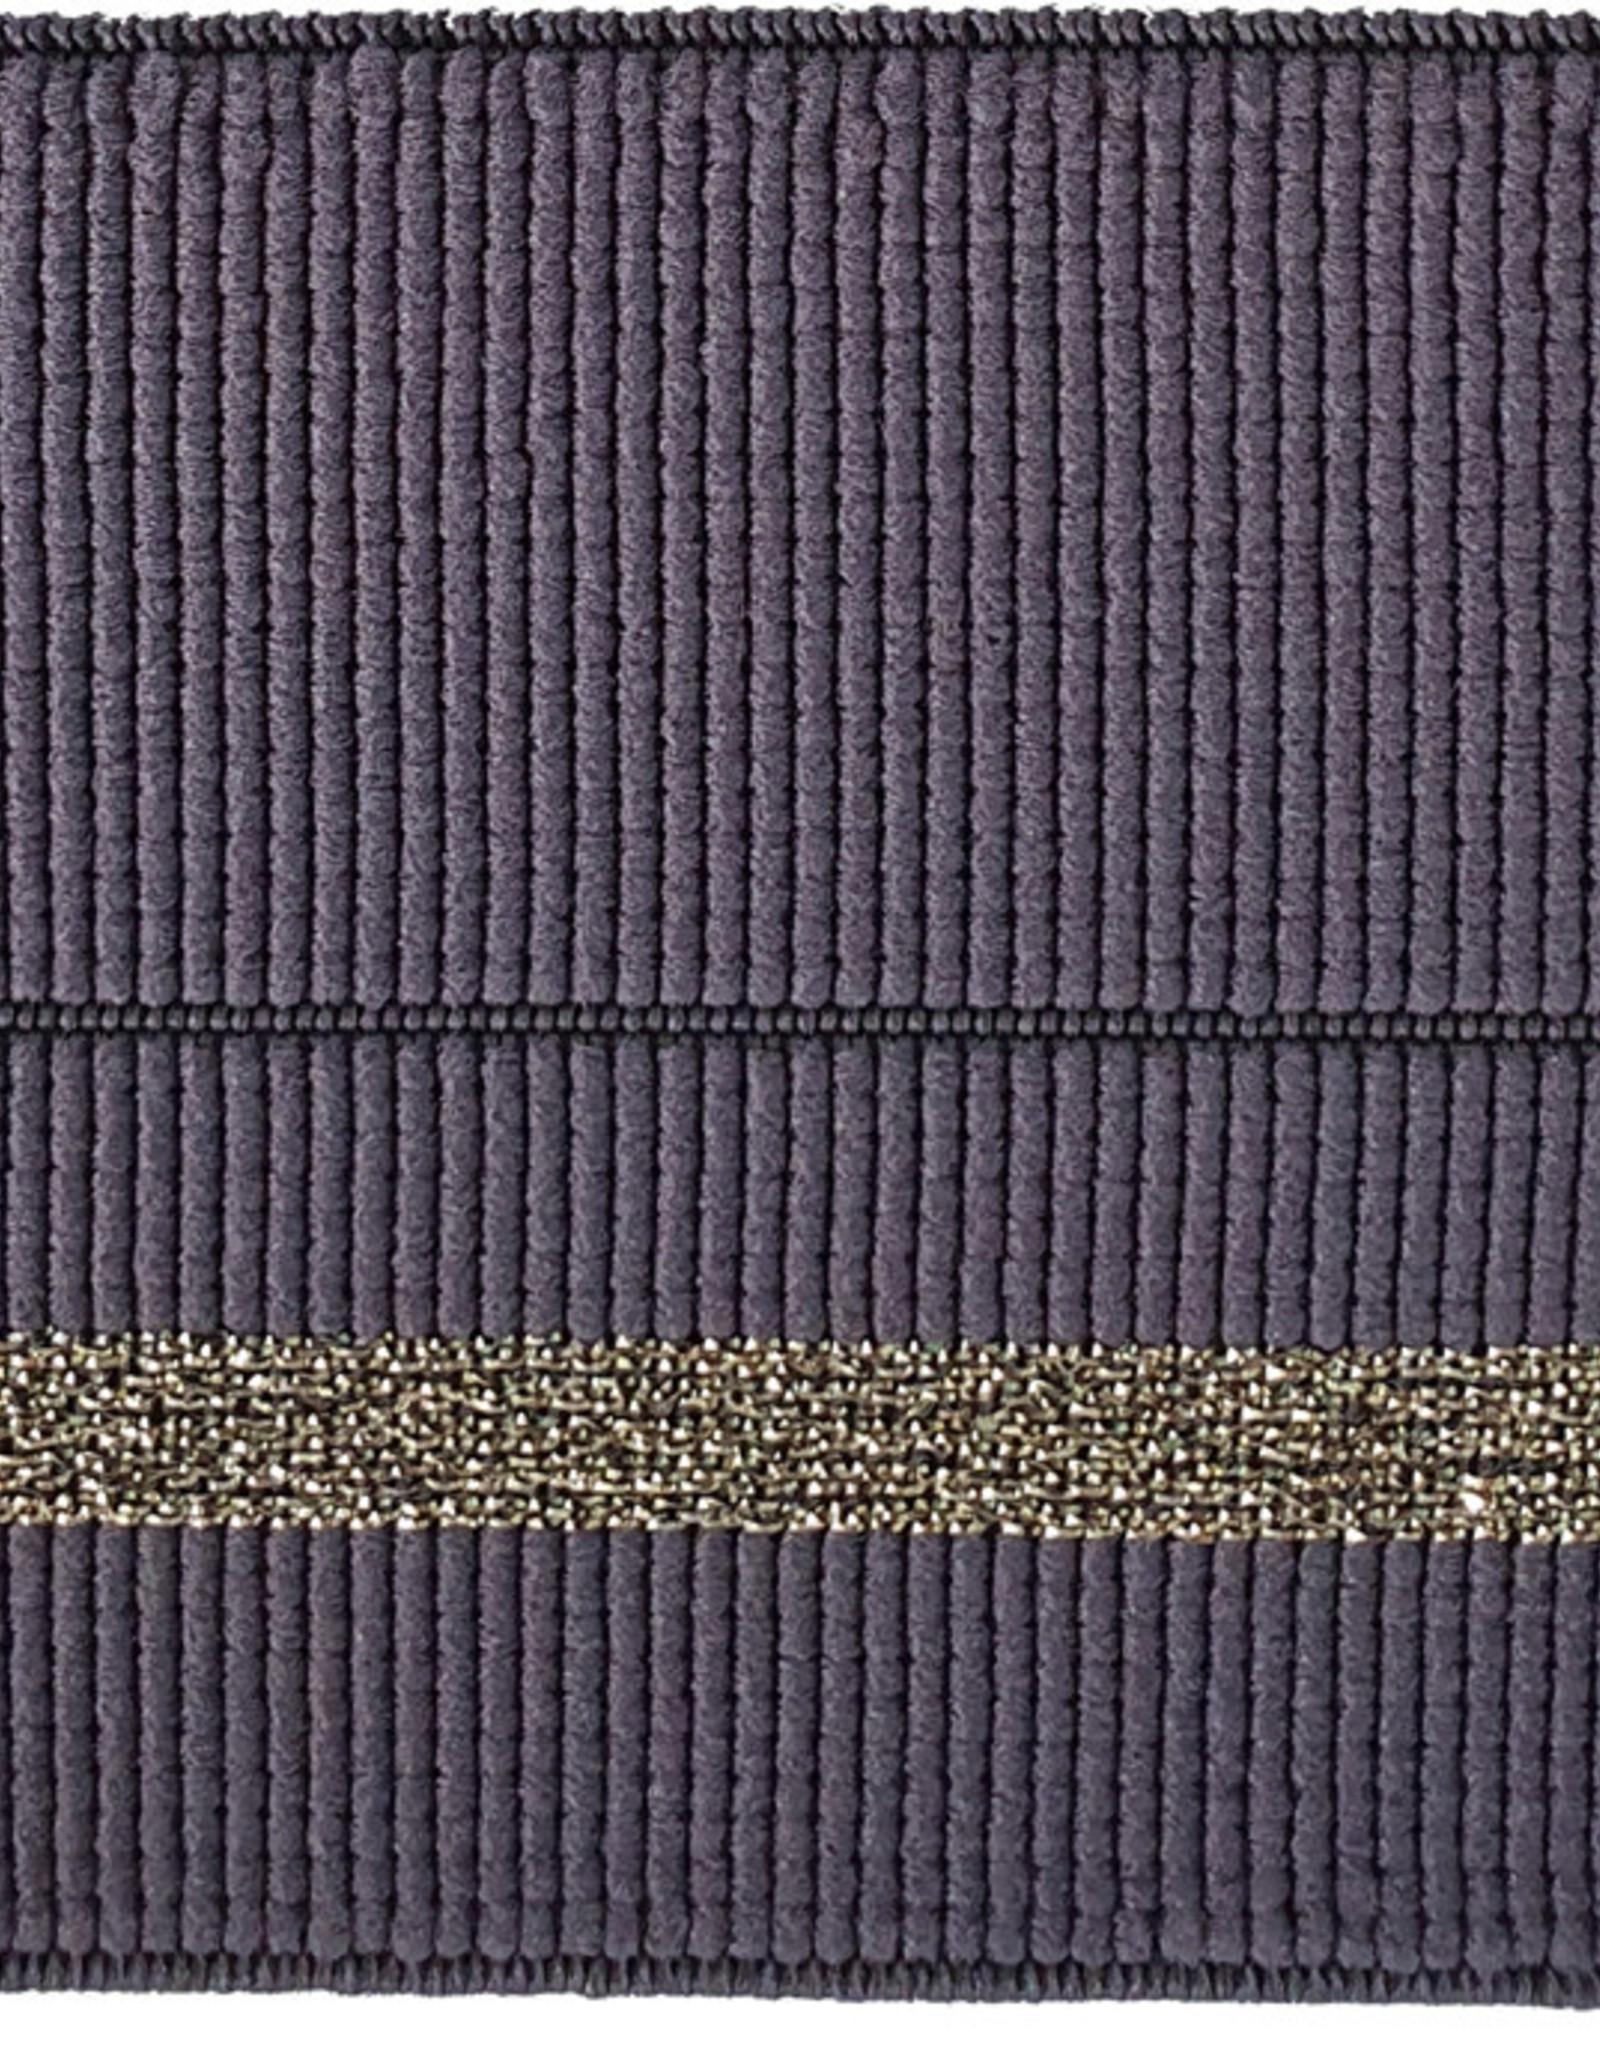 Stik-Stof Sier elastiek antraciet